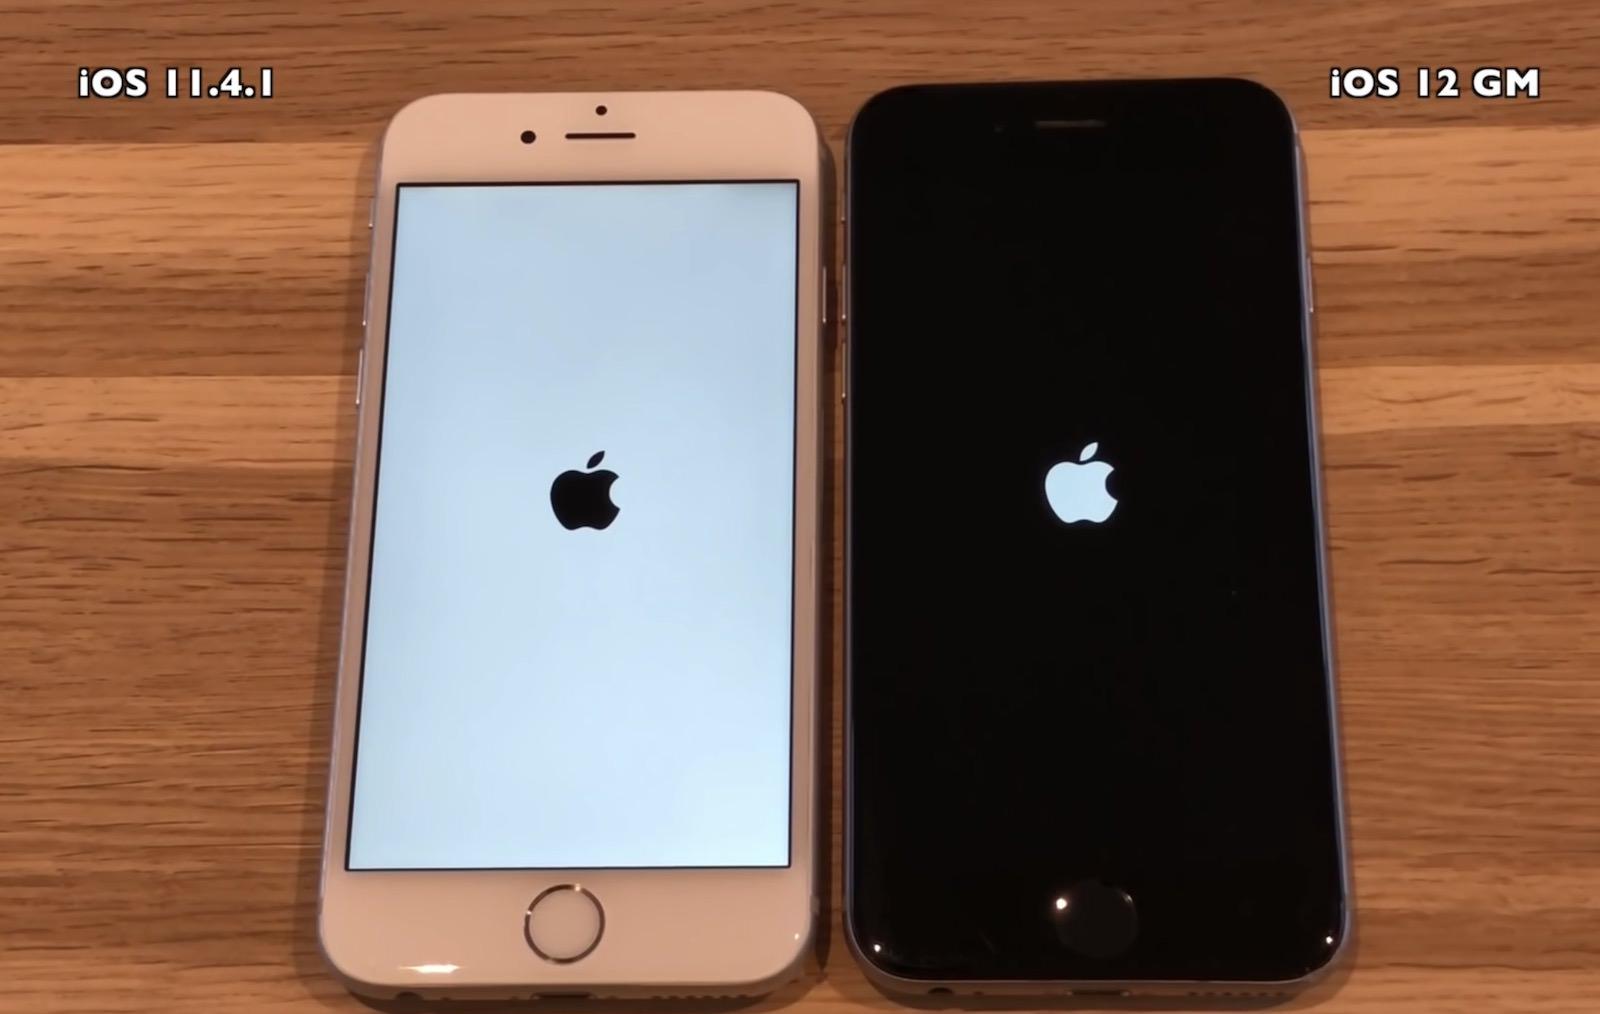 Iphone 6 ios12 vs ios11 4